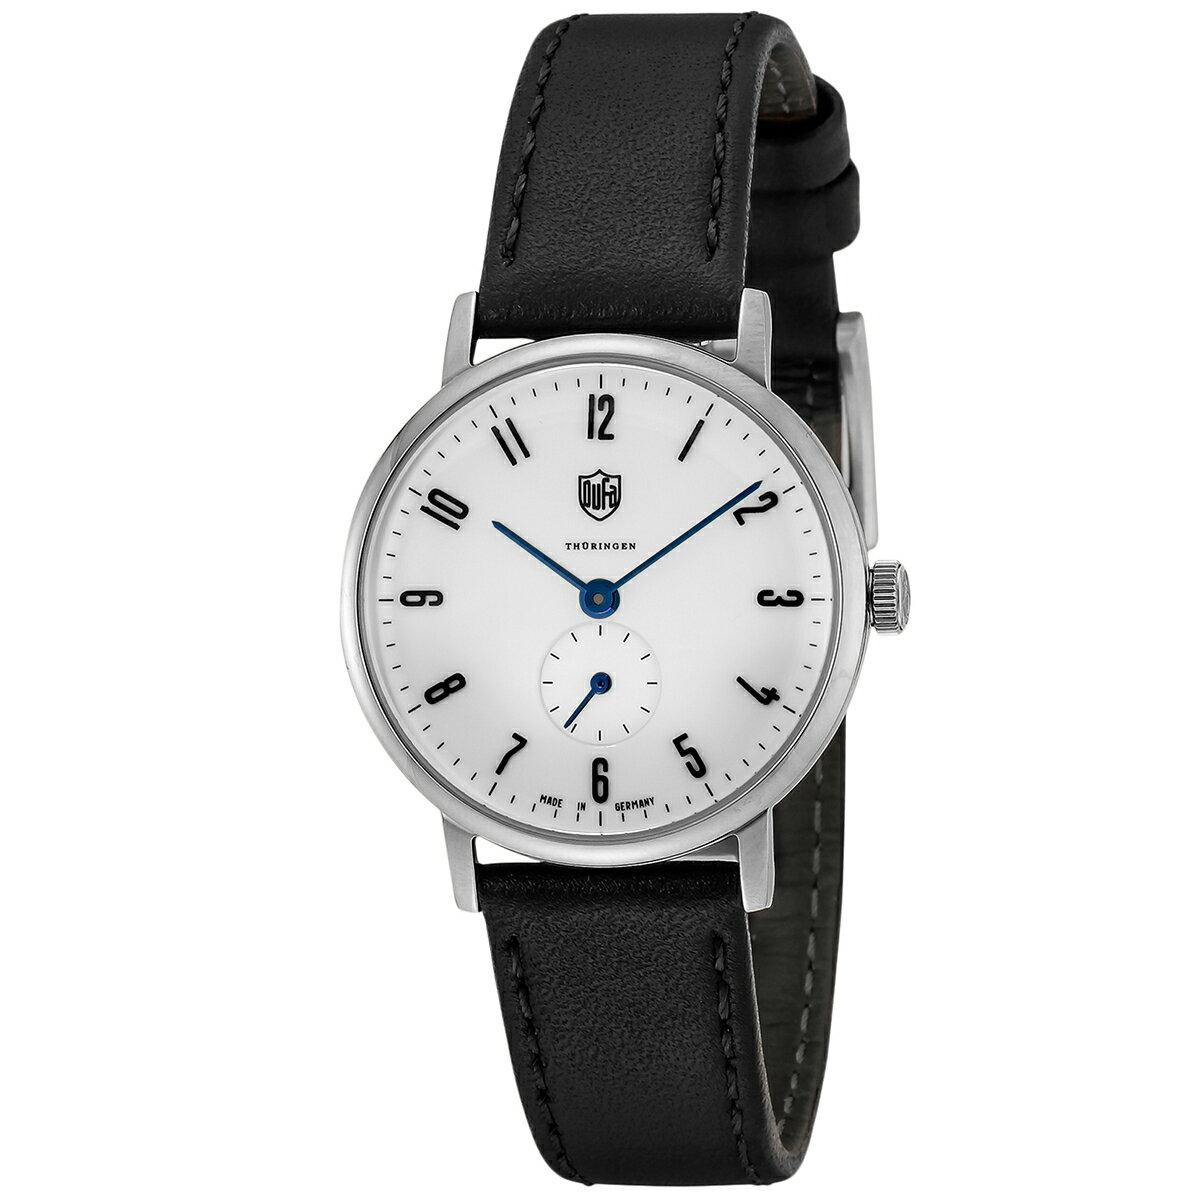 DUFA ドゥッファ DF-7001-03 WALTER GROPIUS レディース 時計 腕時計 プレゼント 贈り物 ギフト ドイツ バウハウス [海外正規商品][送料無料][あす楽]